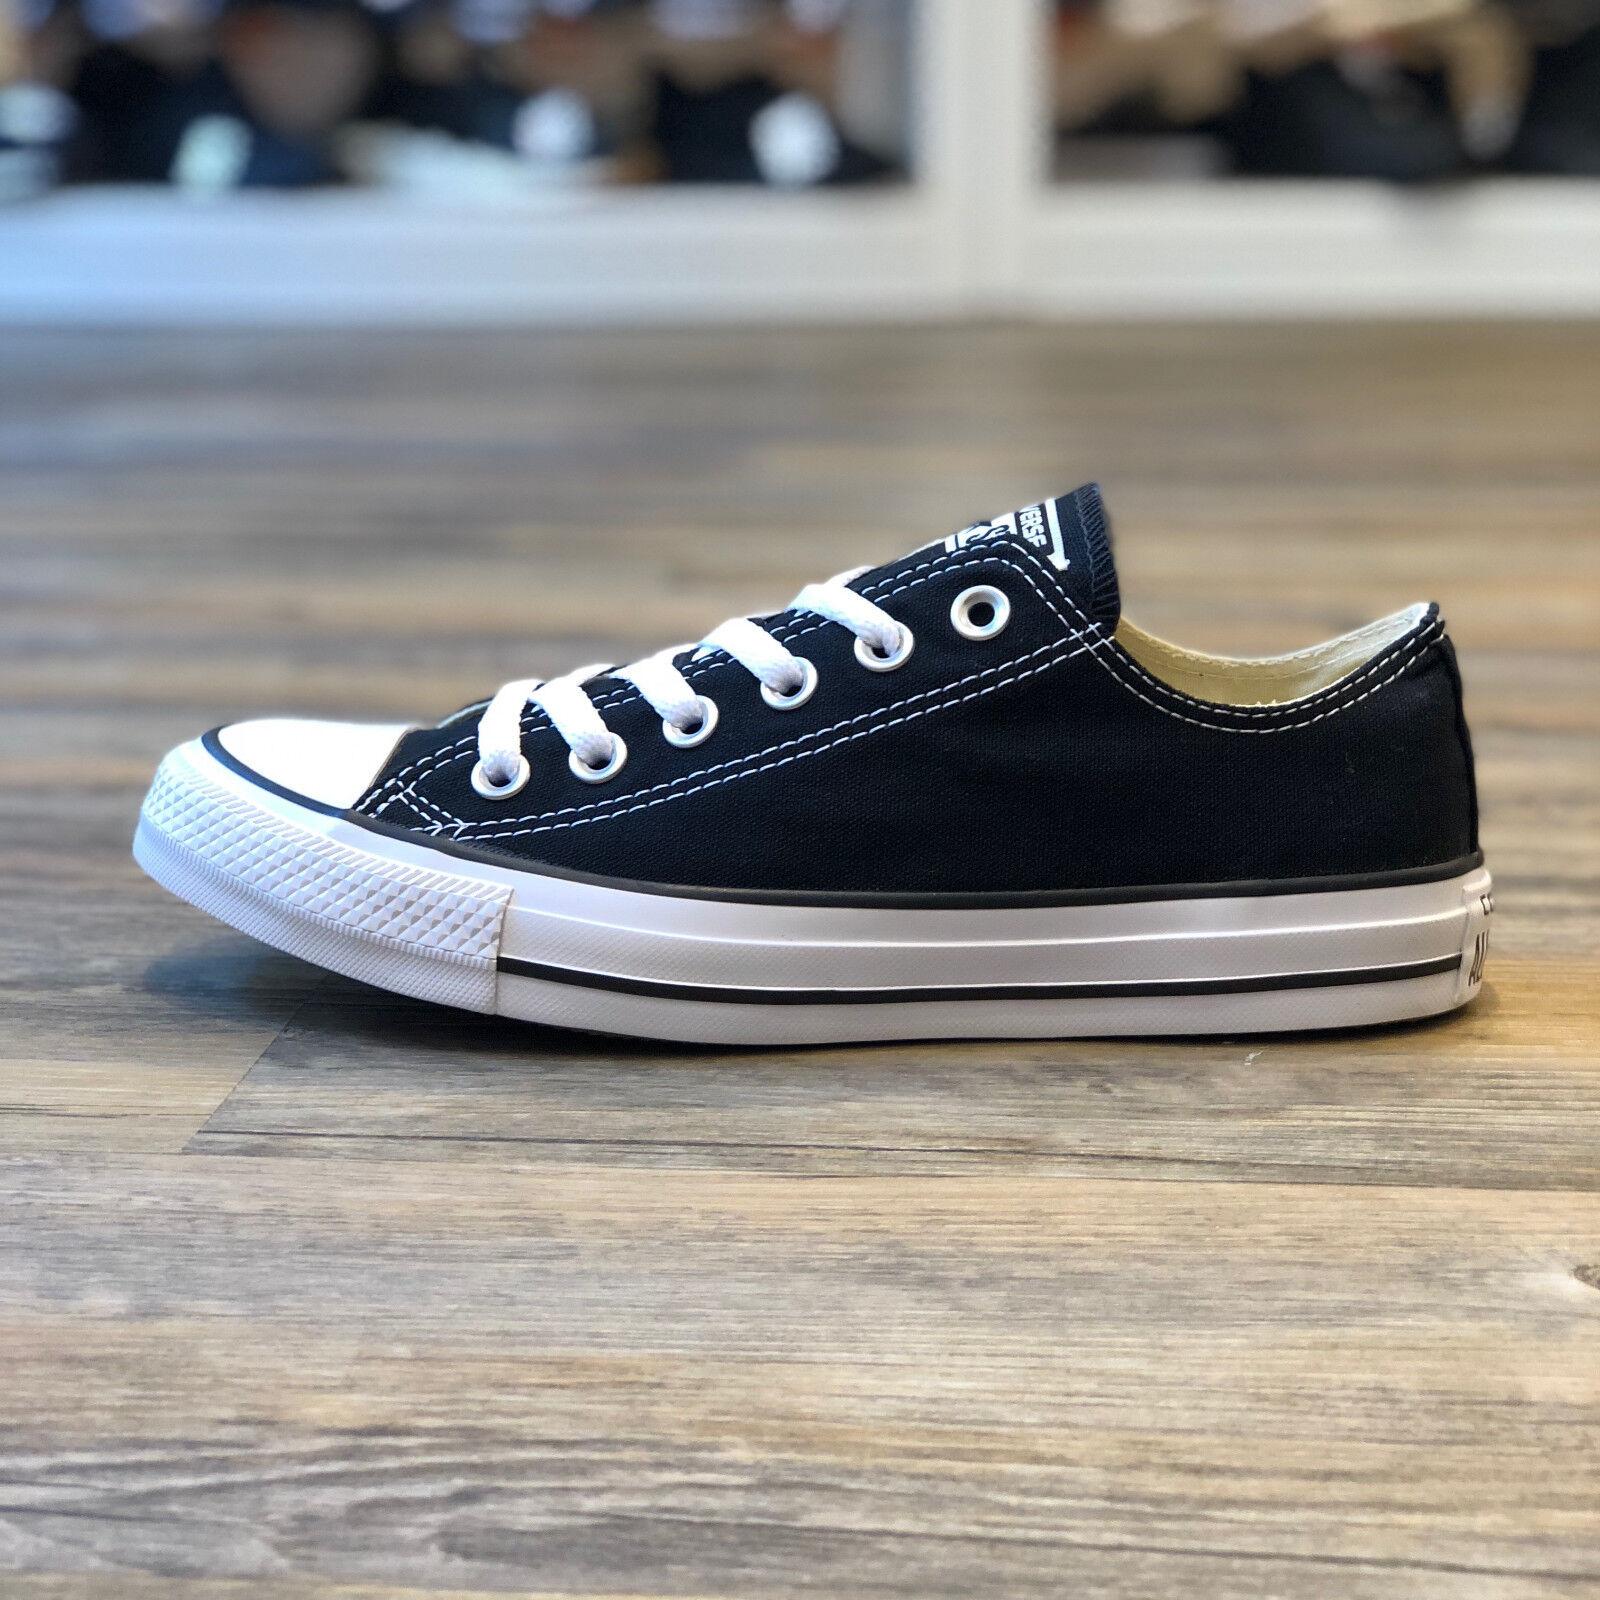 Converse All Star os low talla 37 negro zapatos turn cortos Black señora m9166c